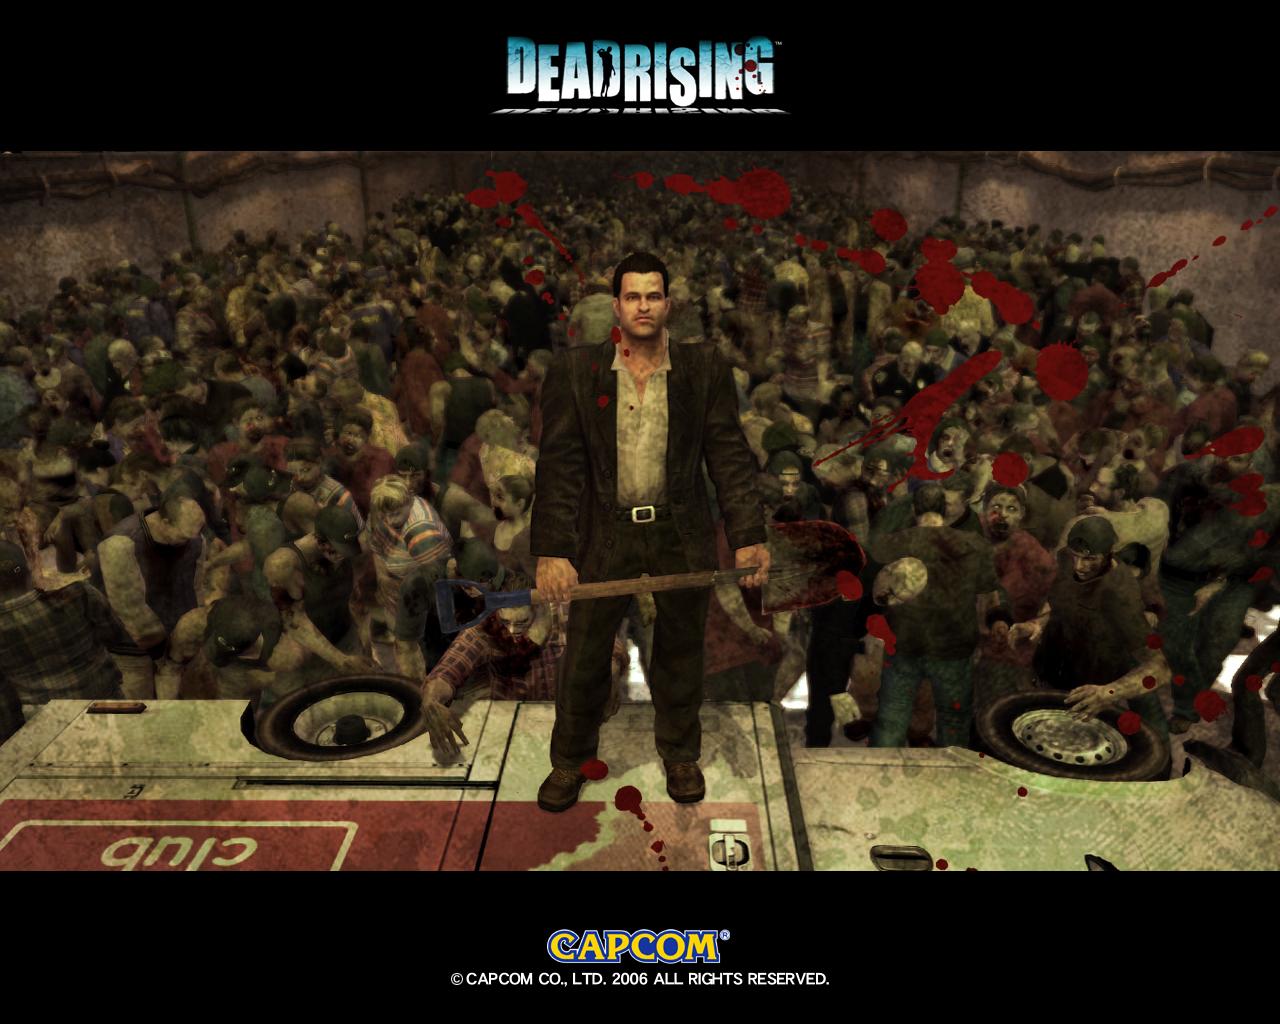 http://2.bp.blogspot.com/-cBOMhCuFvjI/UBc6y2Hm6lI/AAAAAAAAICI/ln-Da3Ct3Ww/s1600/Dead+rising+1+wallpaper+1.jpg